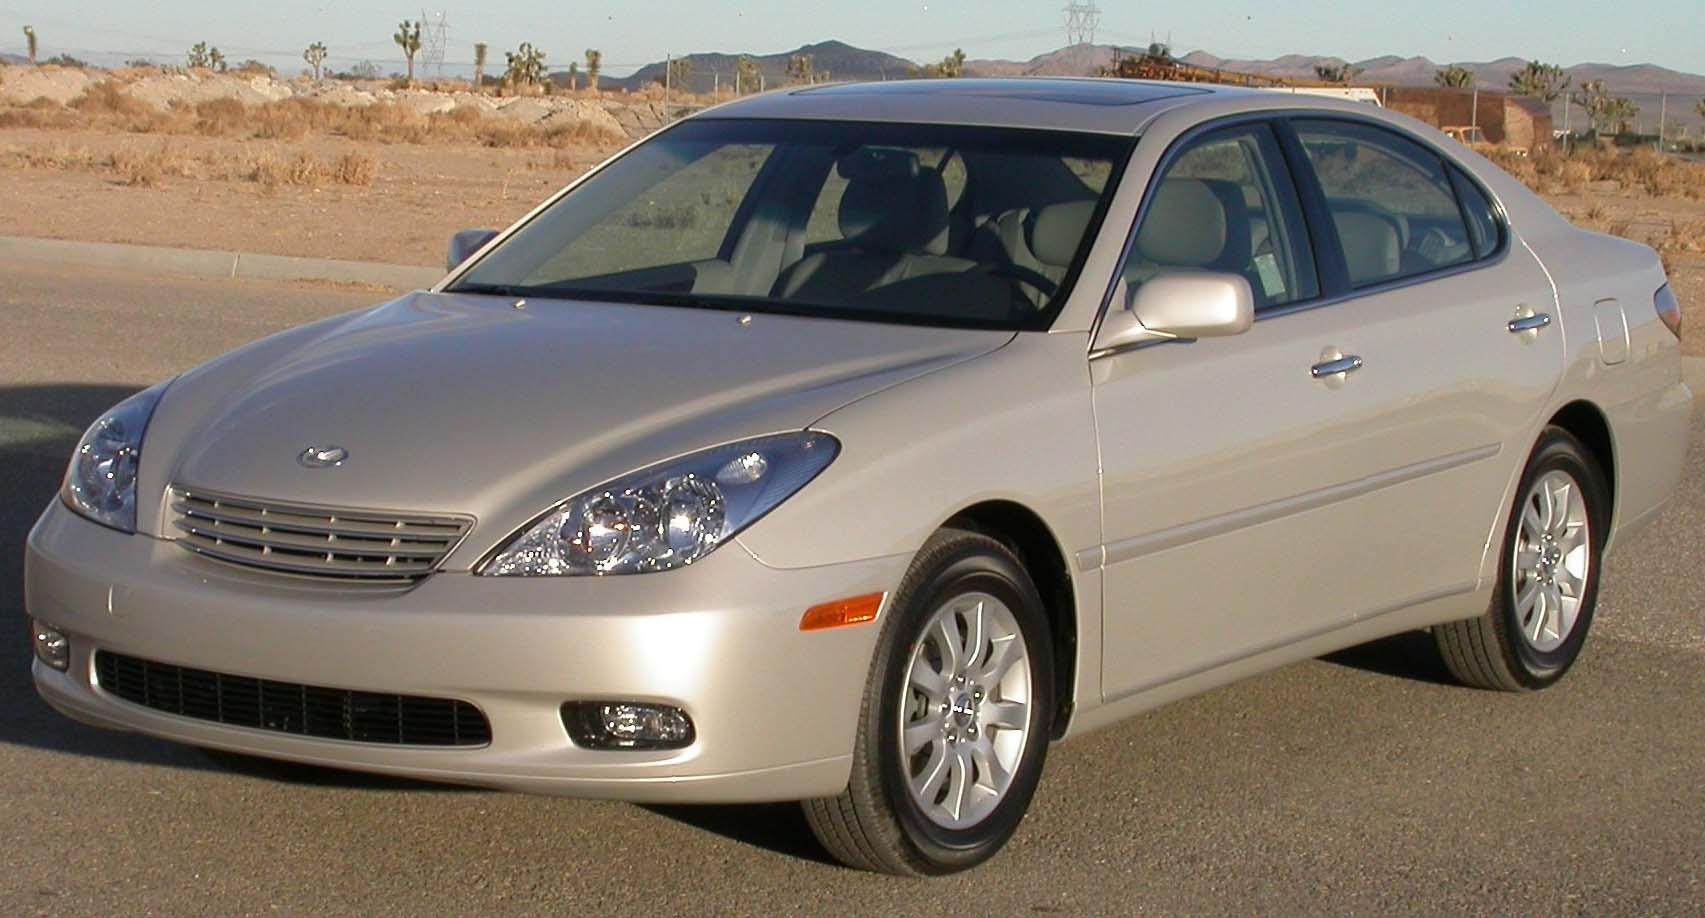 File:2004 Lexus ES330 -- NHTSA.jpg - Wikimedia Commons